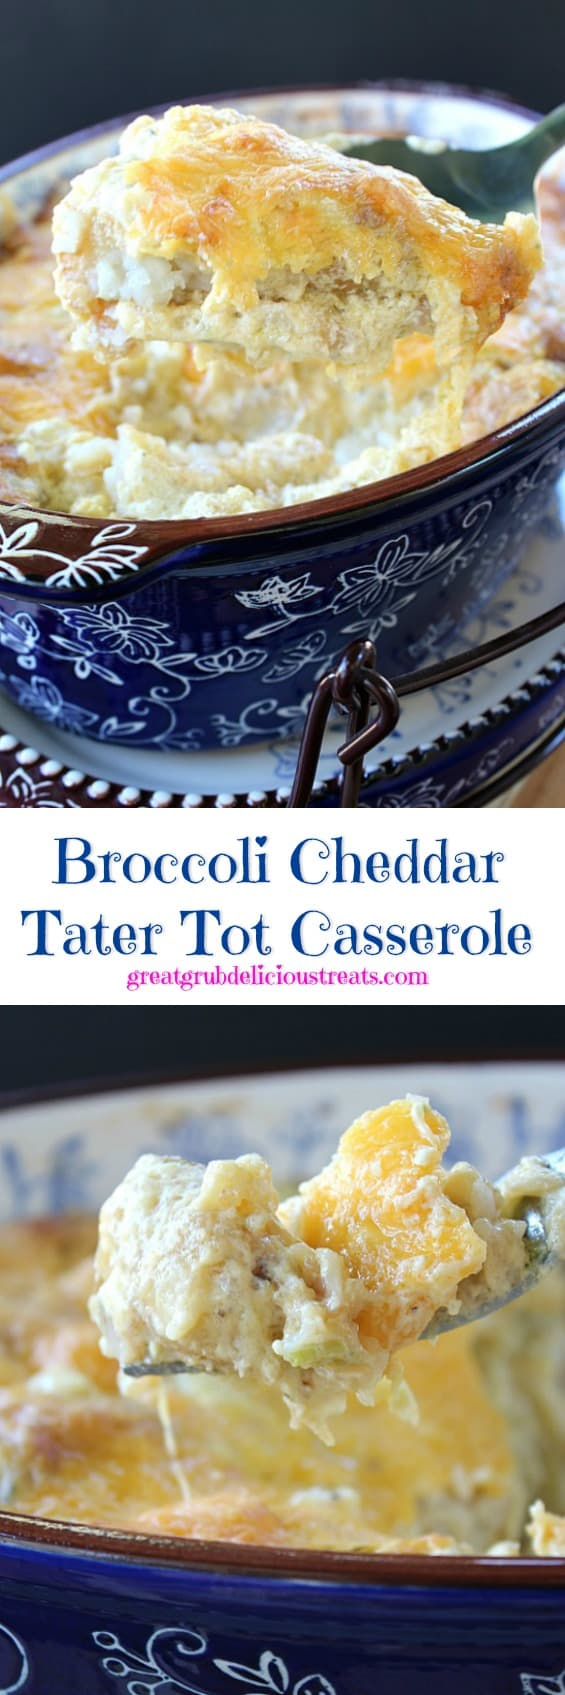 Broccoli Cheddar Tater Tot Casserole